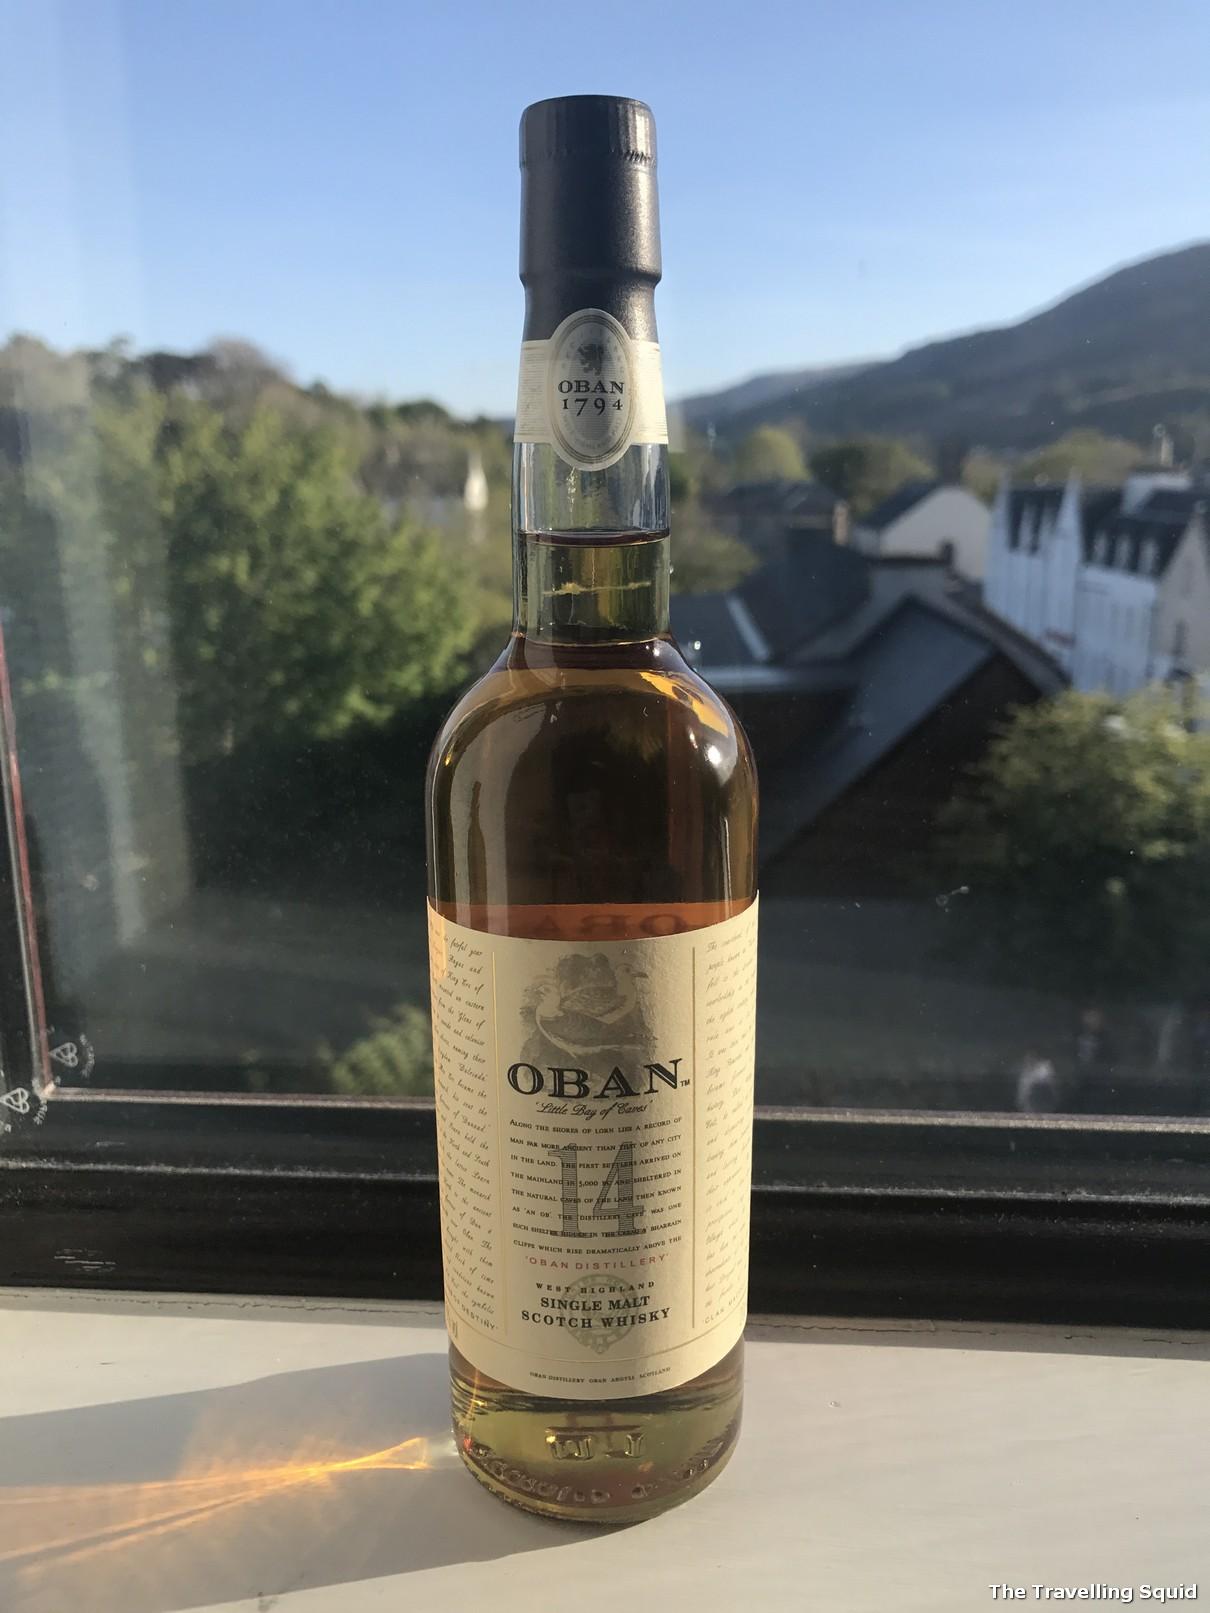 perks of visiting the Oban whisky distillery instead of Talisker